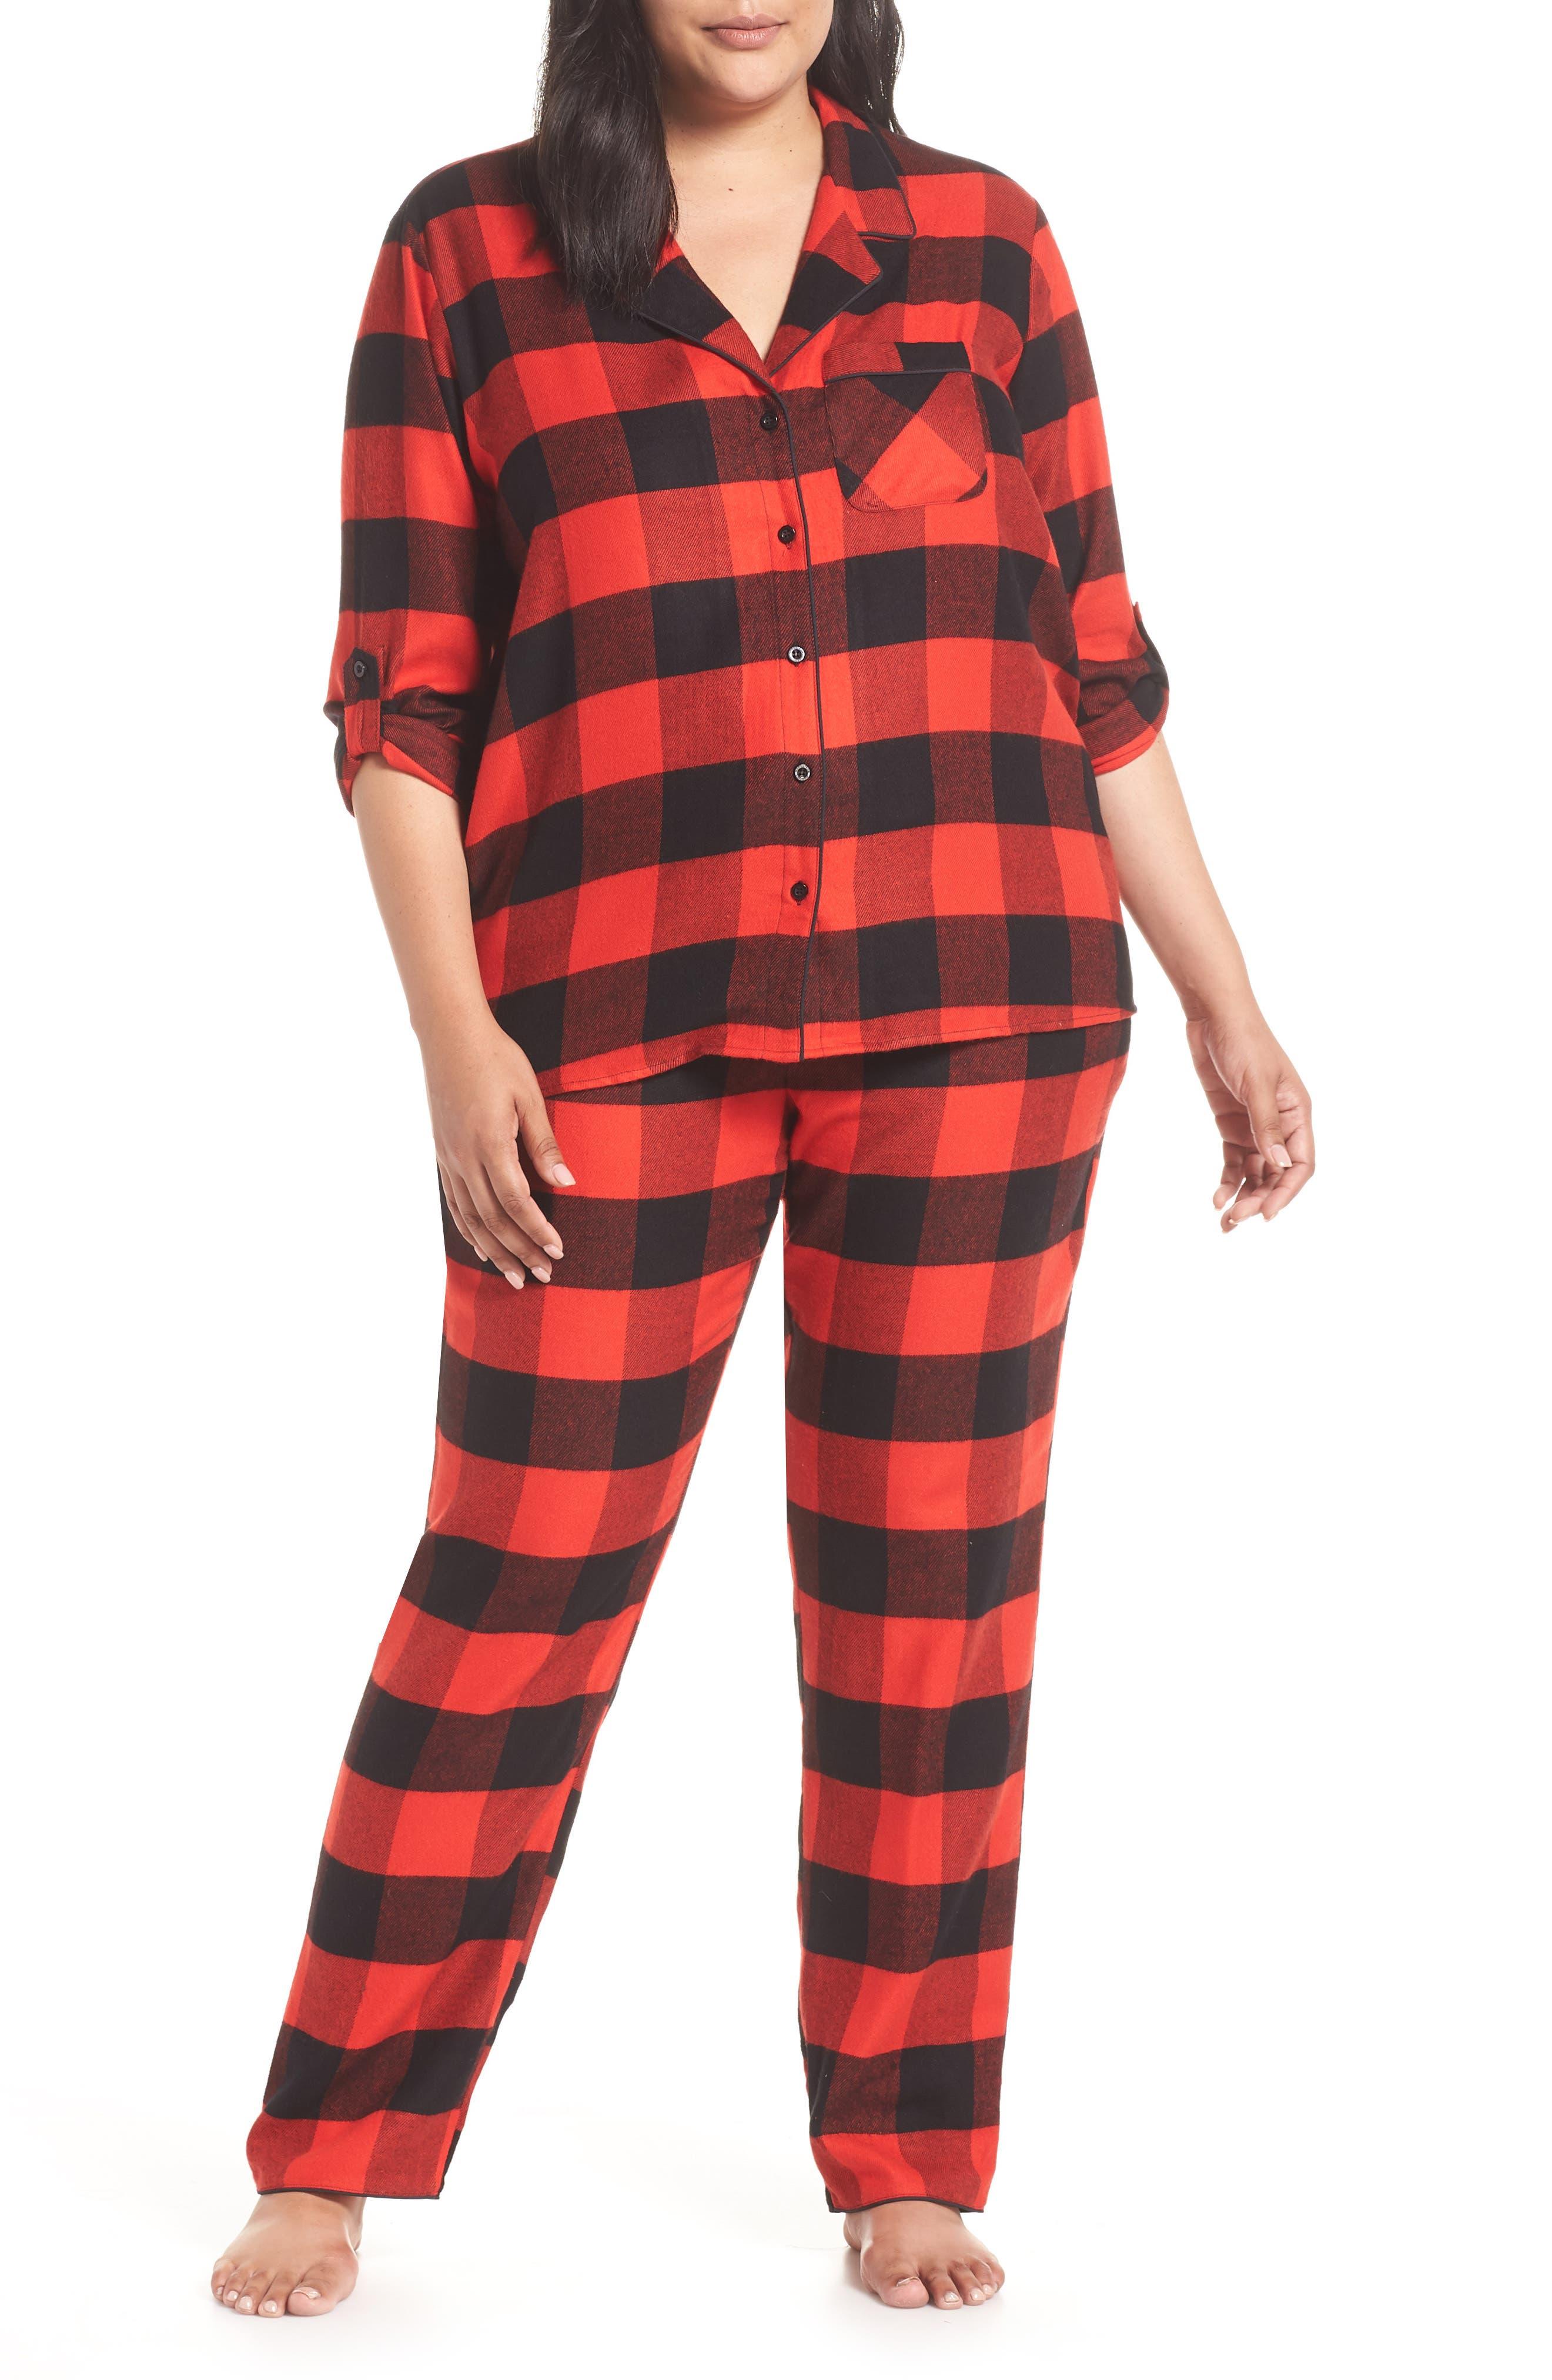 Starlight Plaid Flannel Pajamas,                             Main thumbnail 1, color,                             RED BLOOM LARGE BUFFALO CHECK